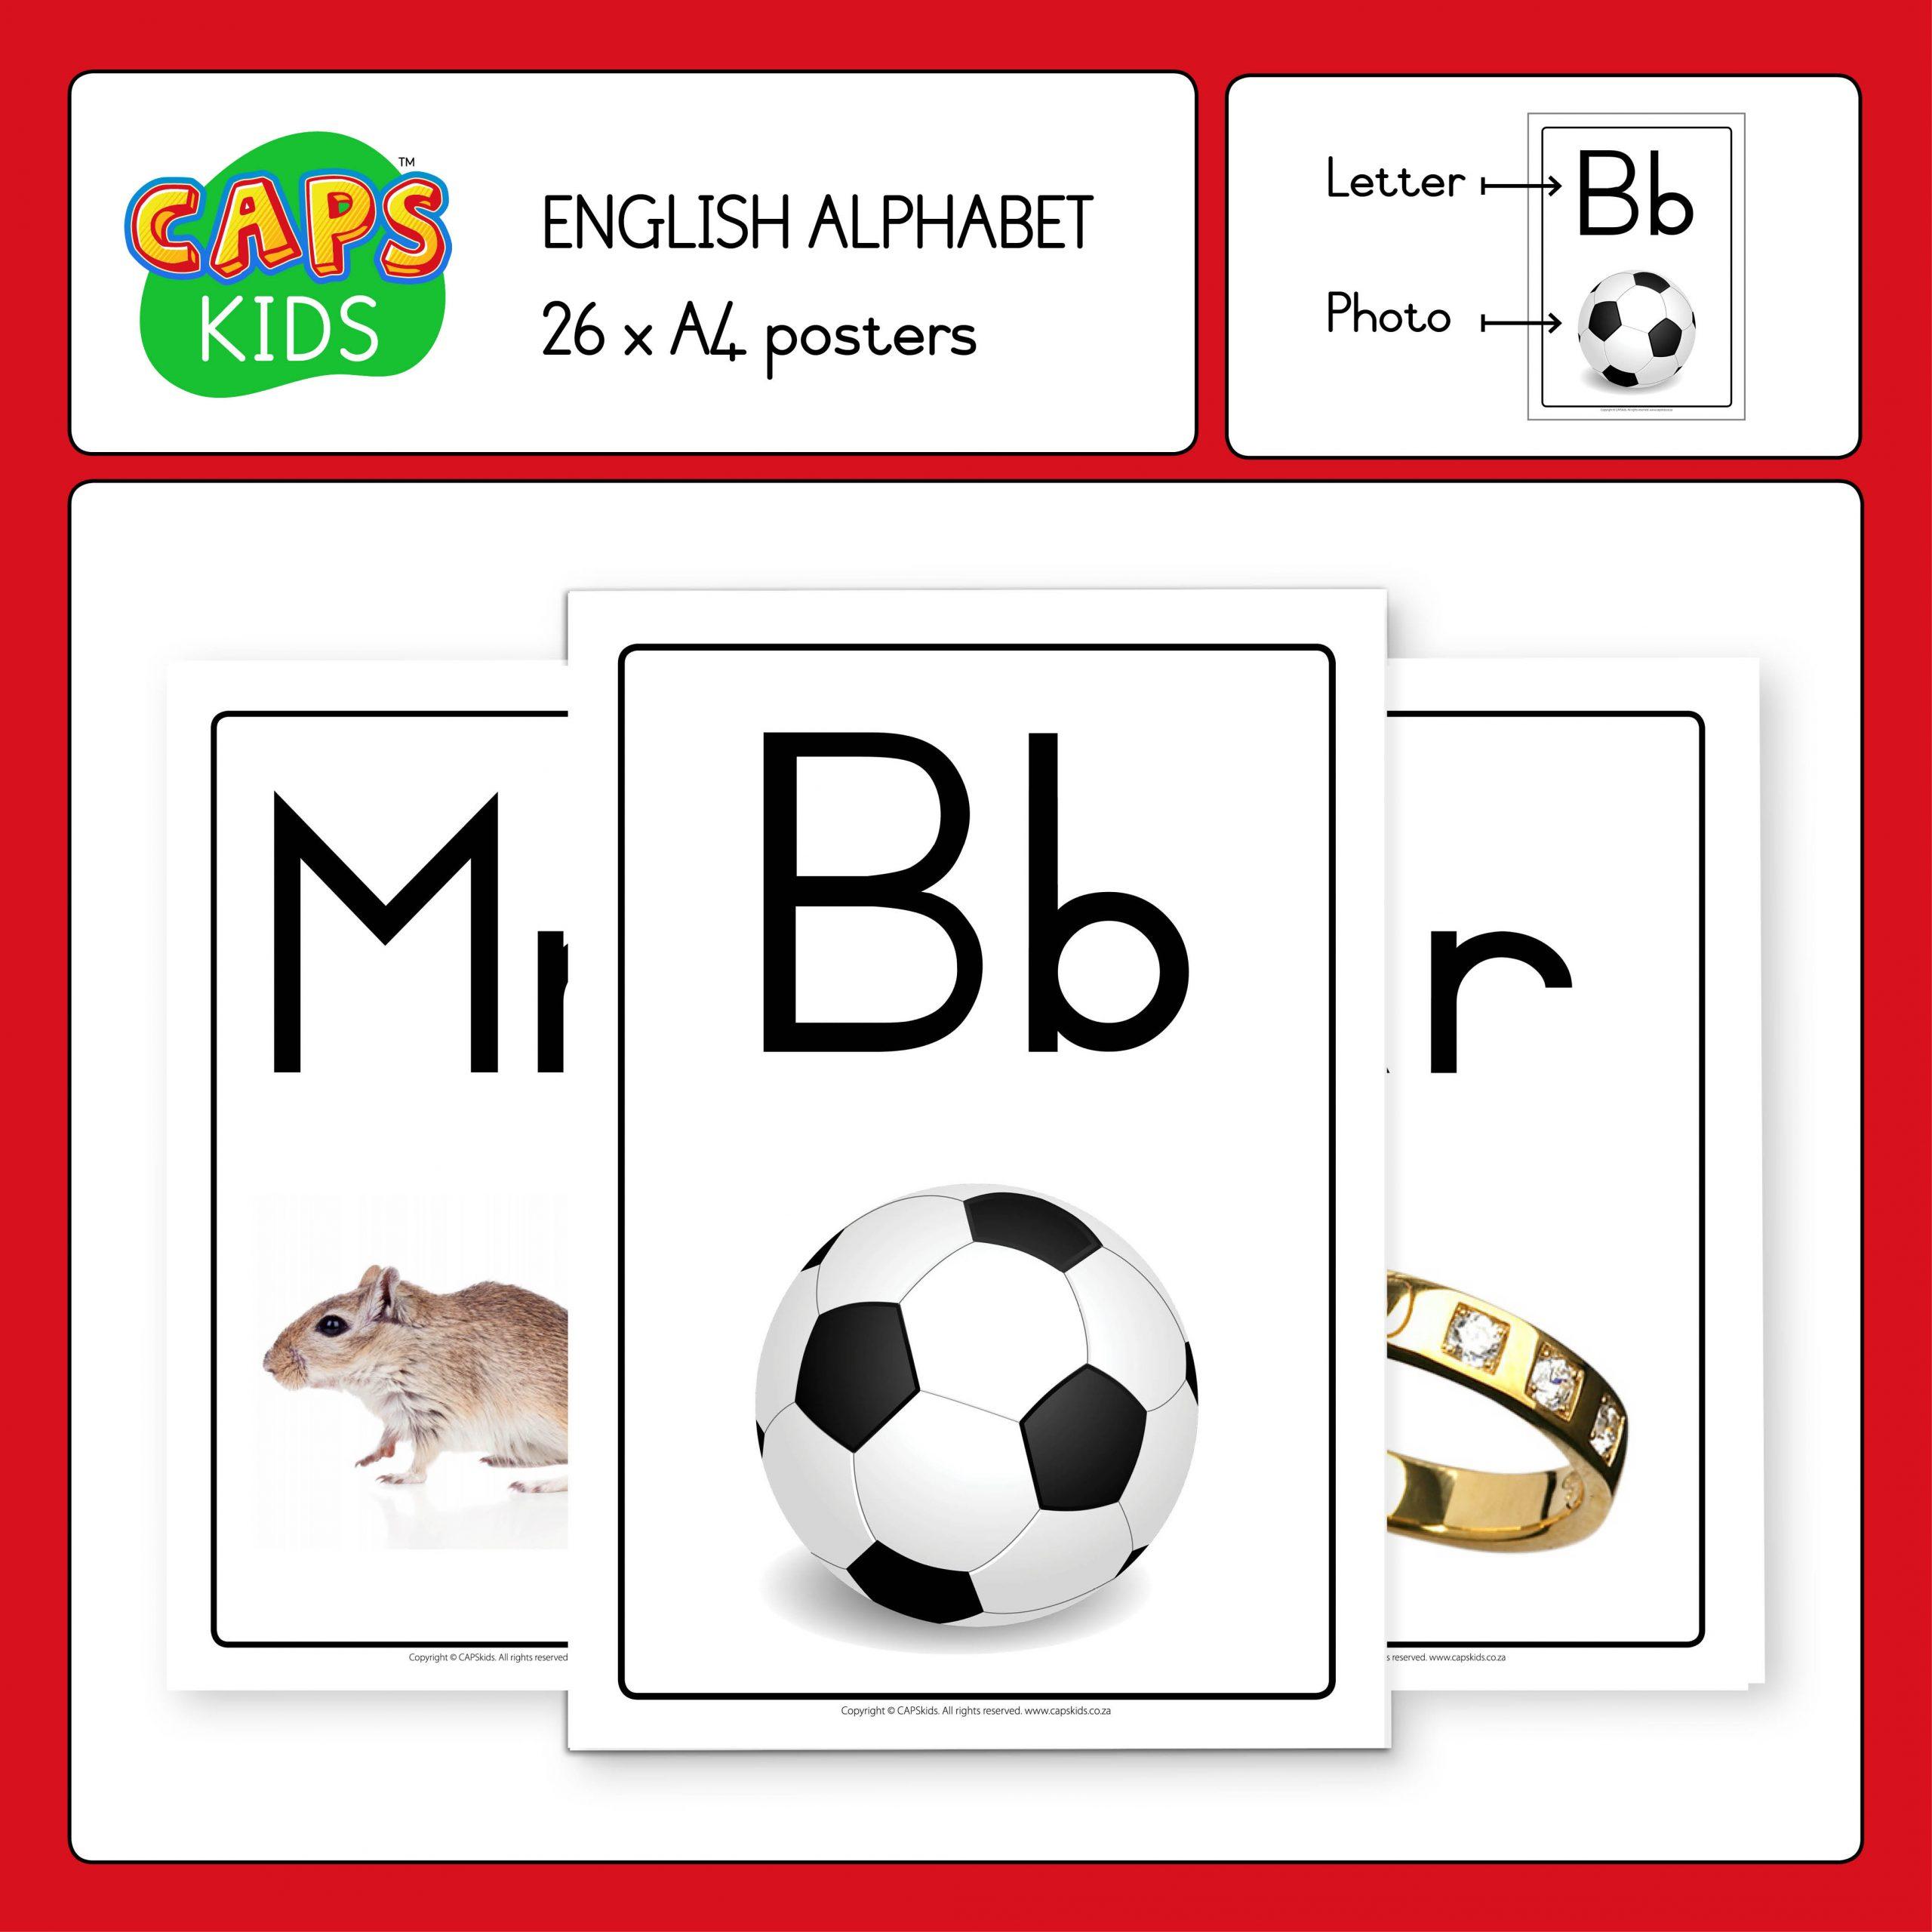 CAPSkids A4 Posters - English Alphabet